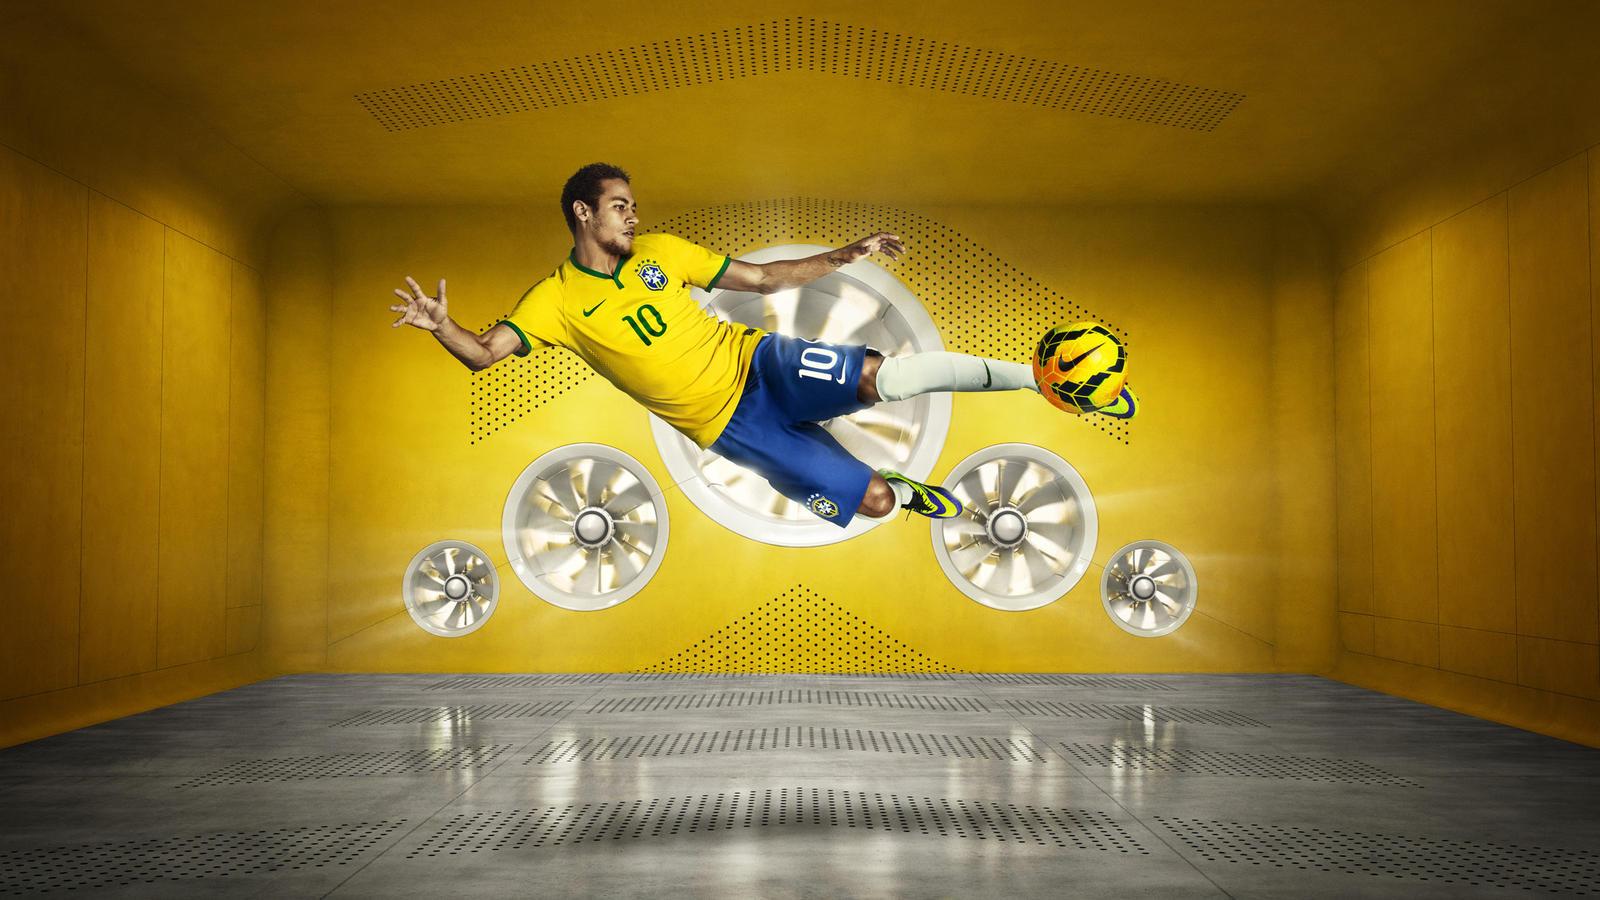 Ho13 Fb Ntk Cbf Neymar Hero 01%20copy